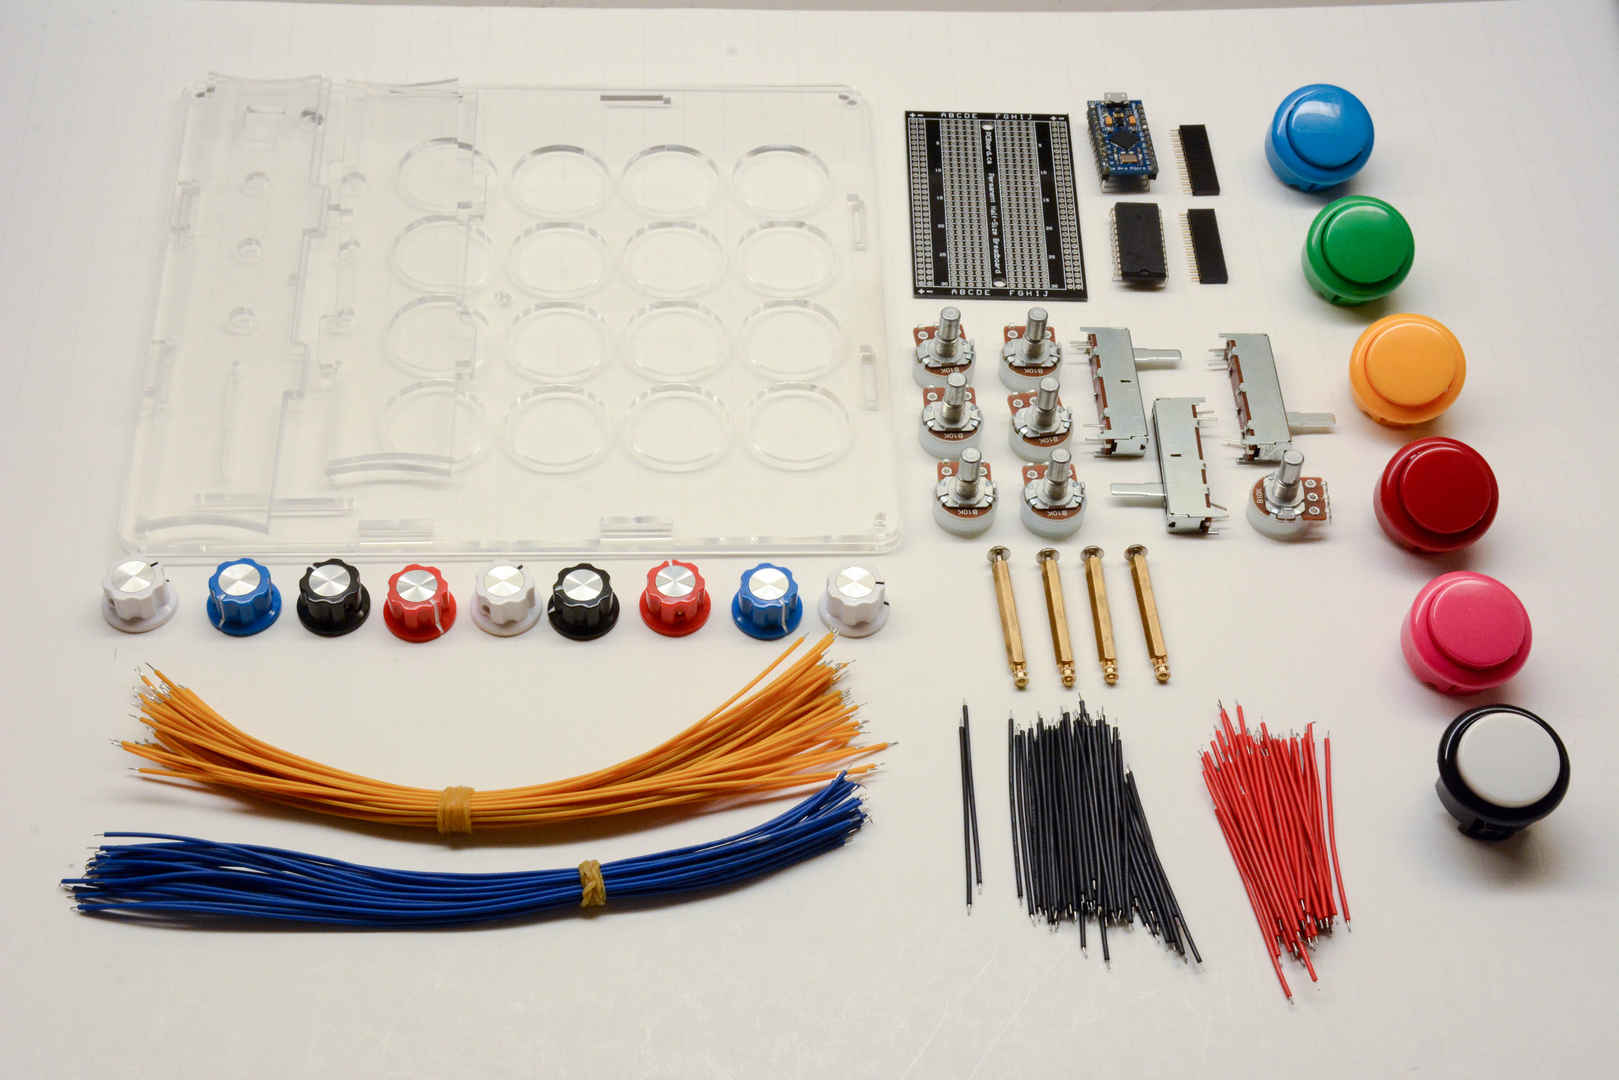 Diy midi controller kit